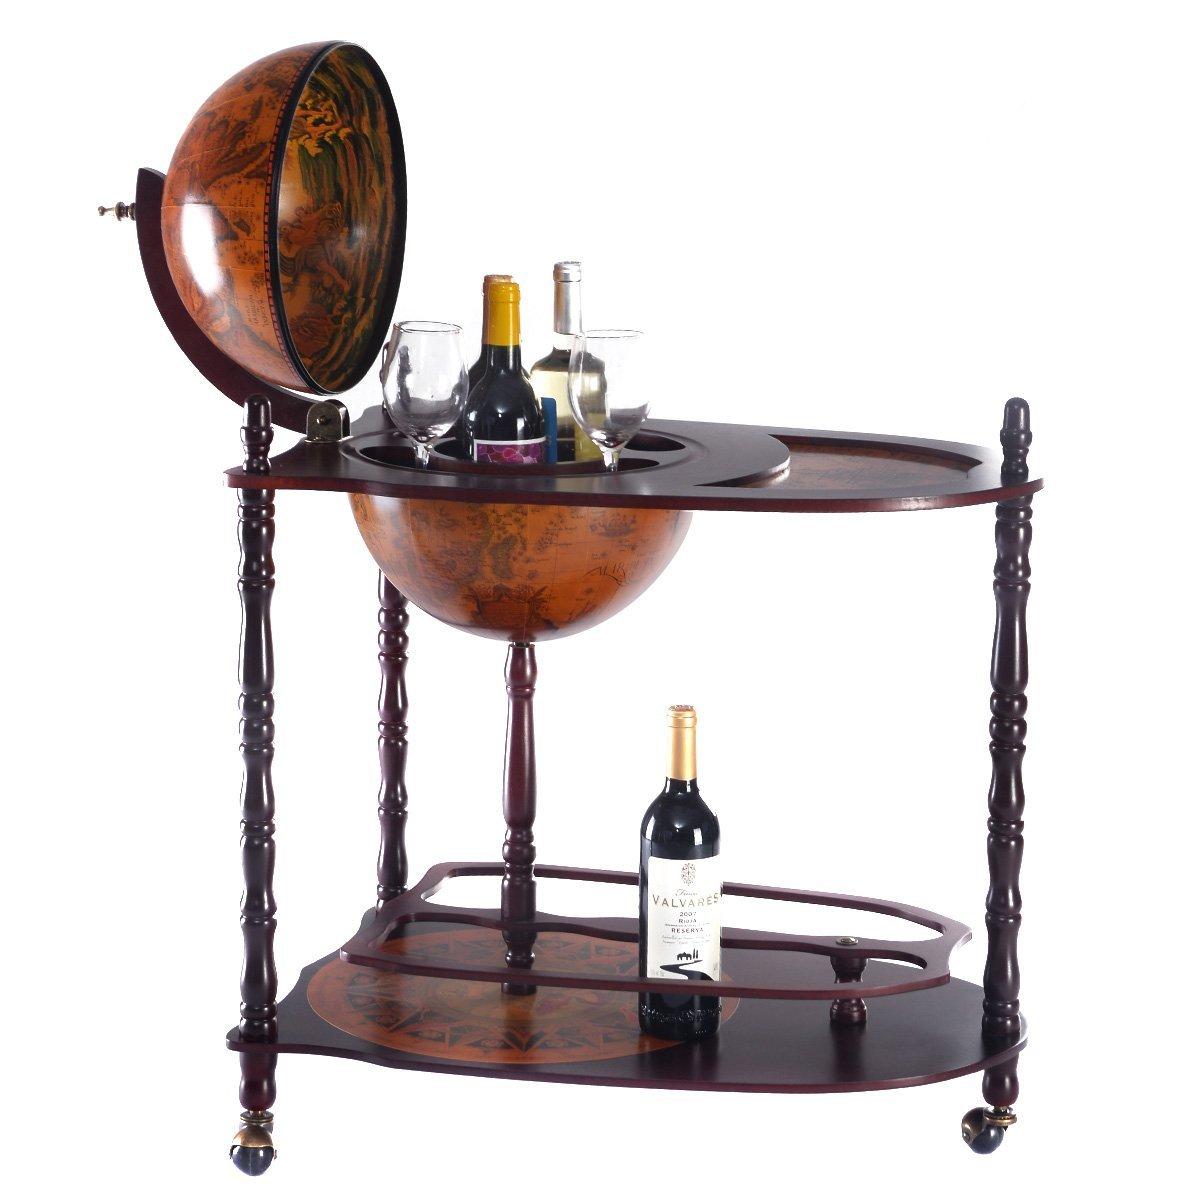 minibar selber bauen best im with minibar selber bauen grill selber bauen forum smoker selber. Black Bedroom Furniture Sets. Home Design Ideas